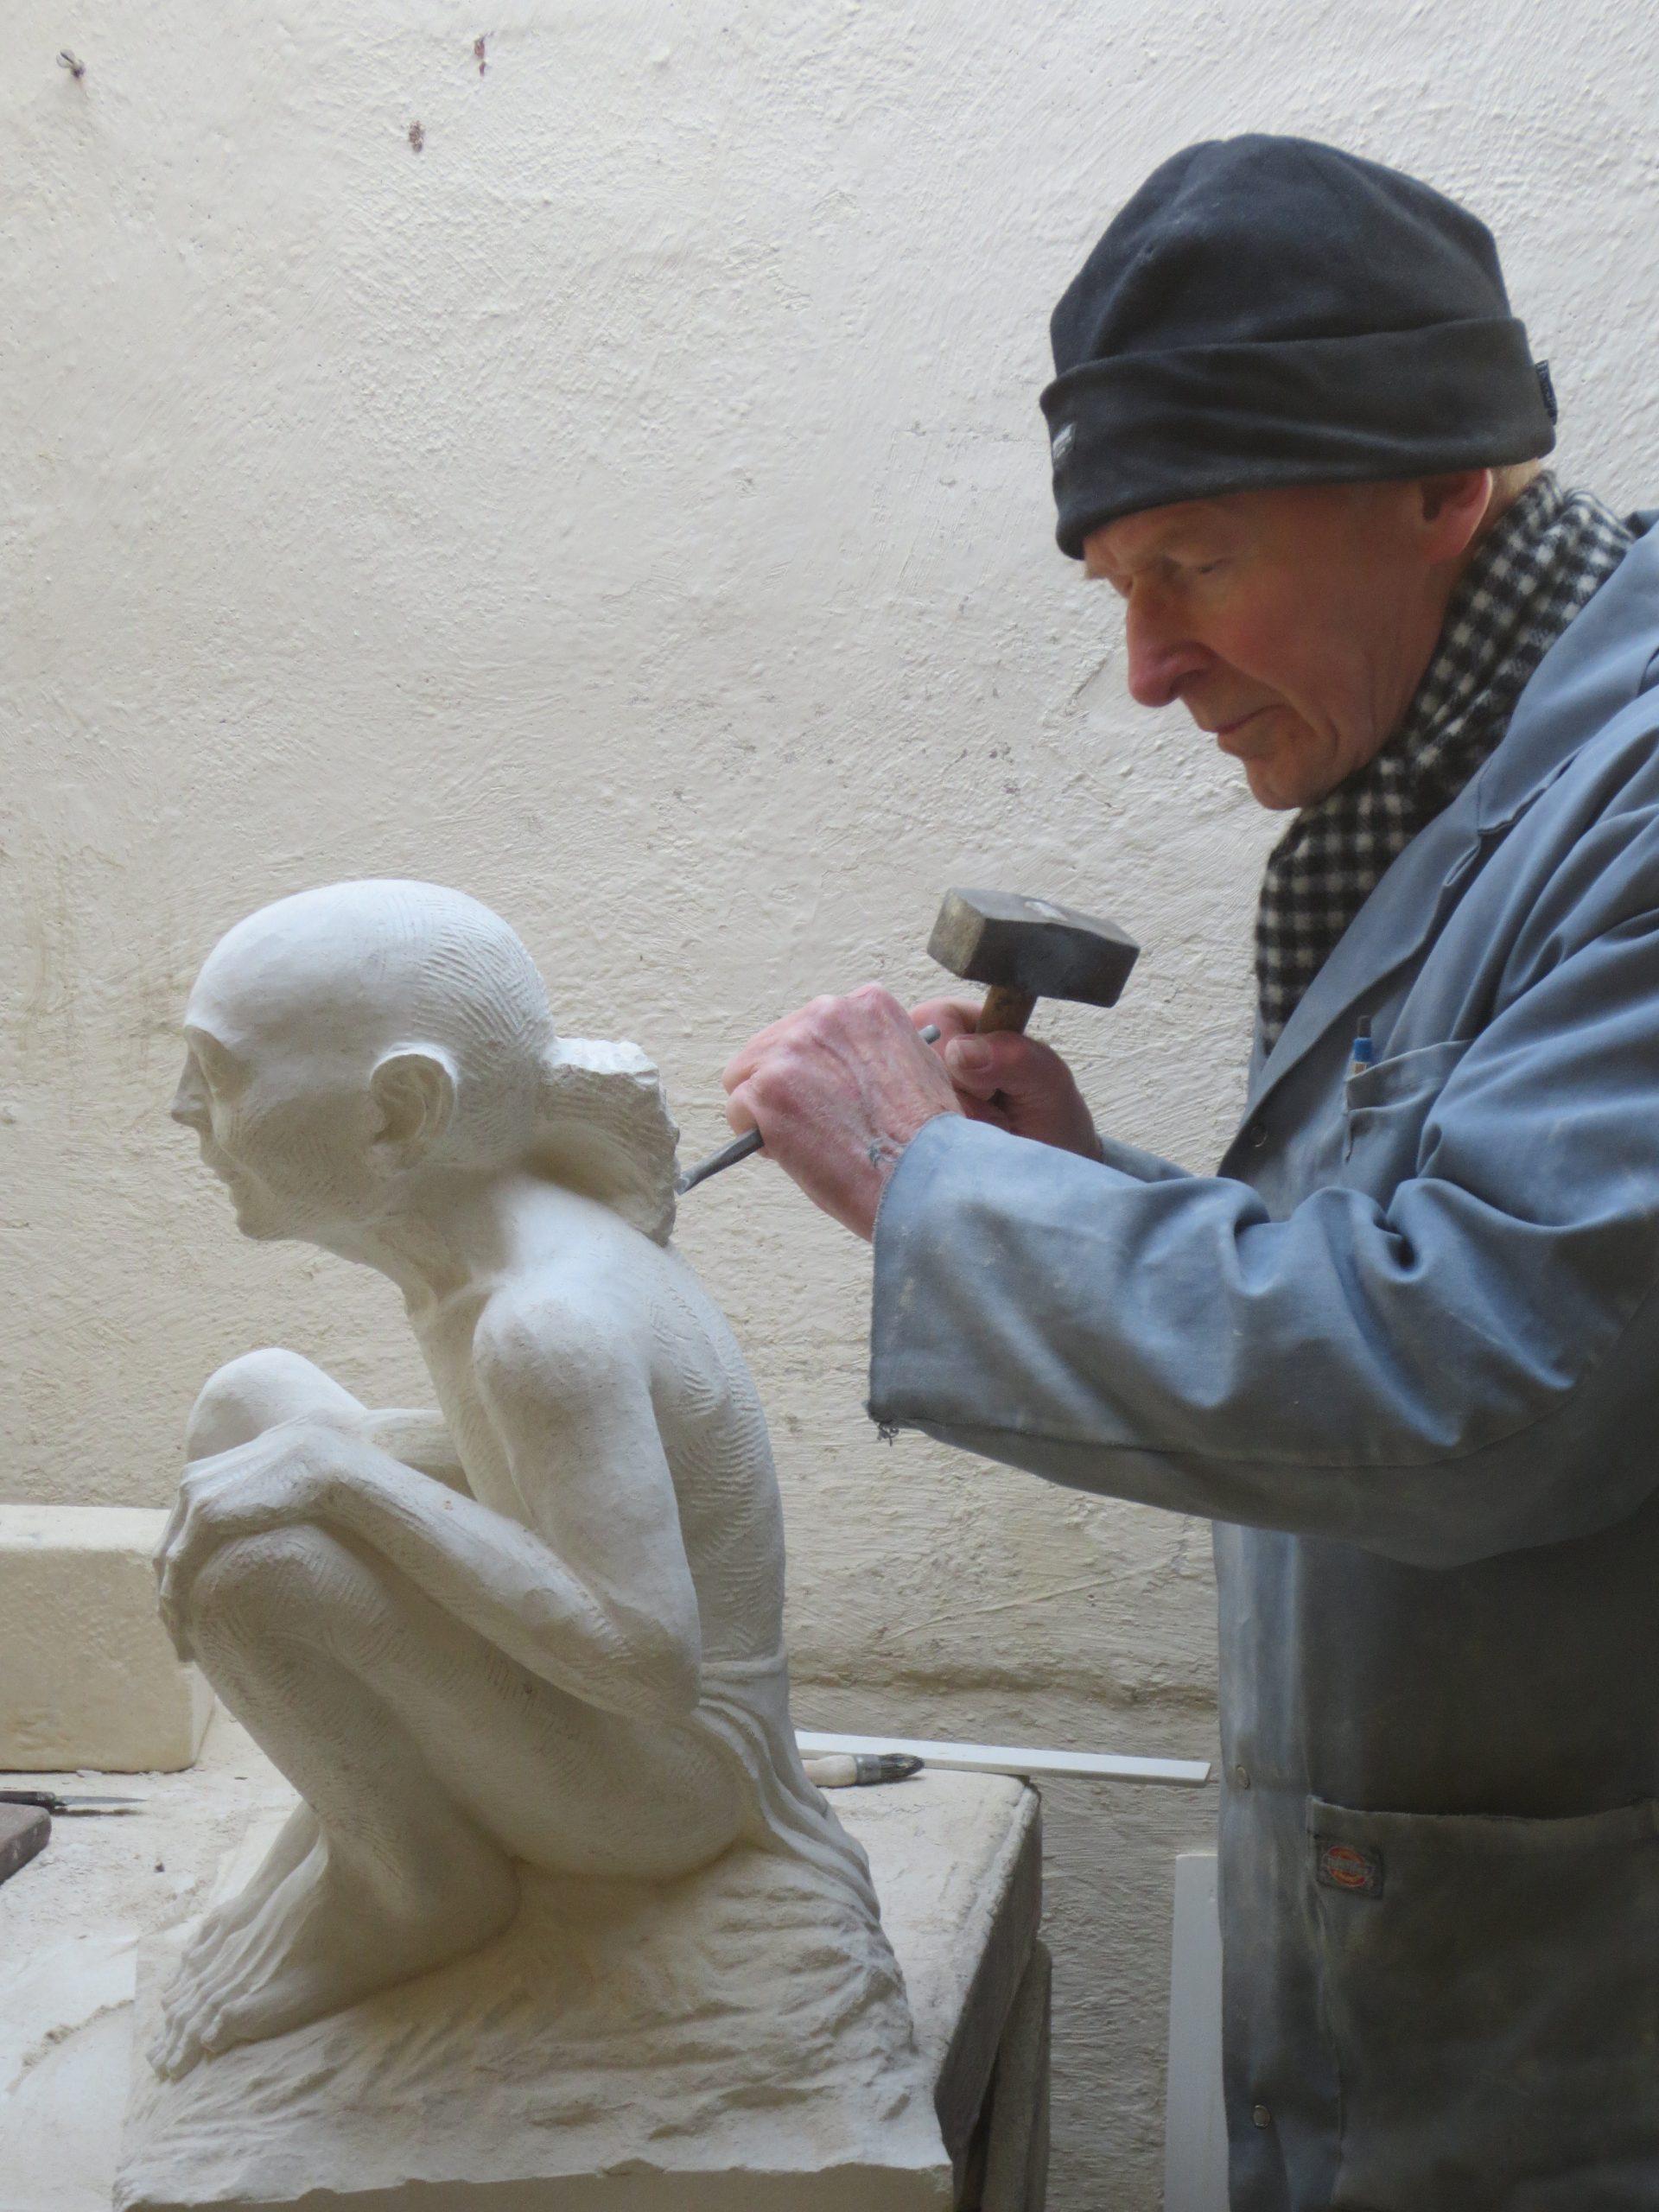 Carving a fine piece of Portland stone